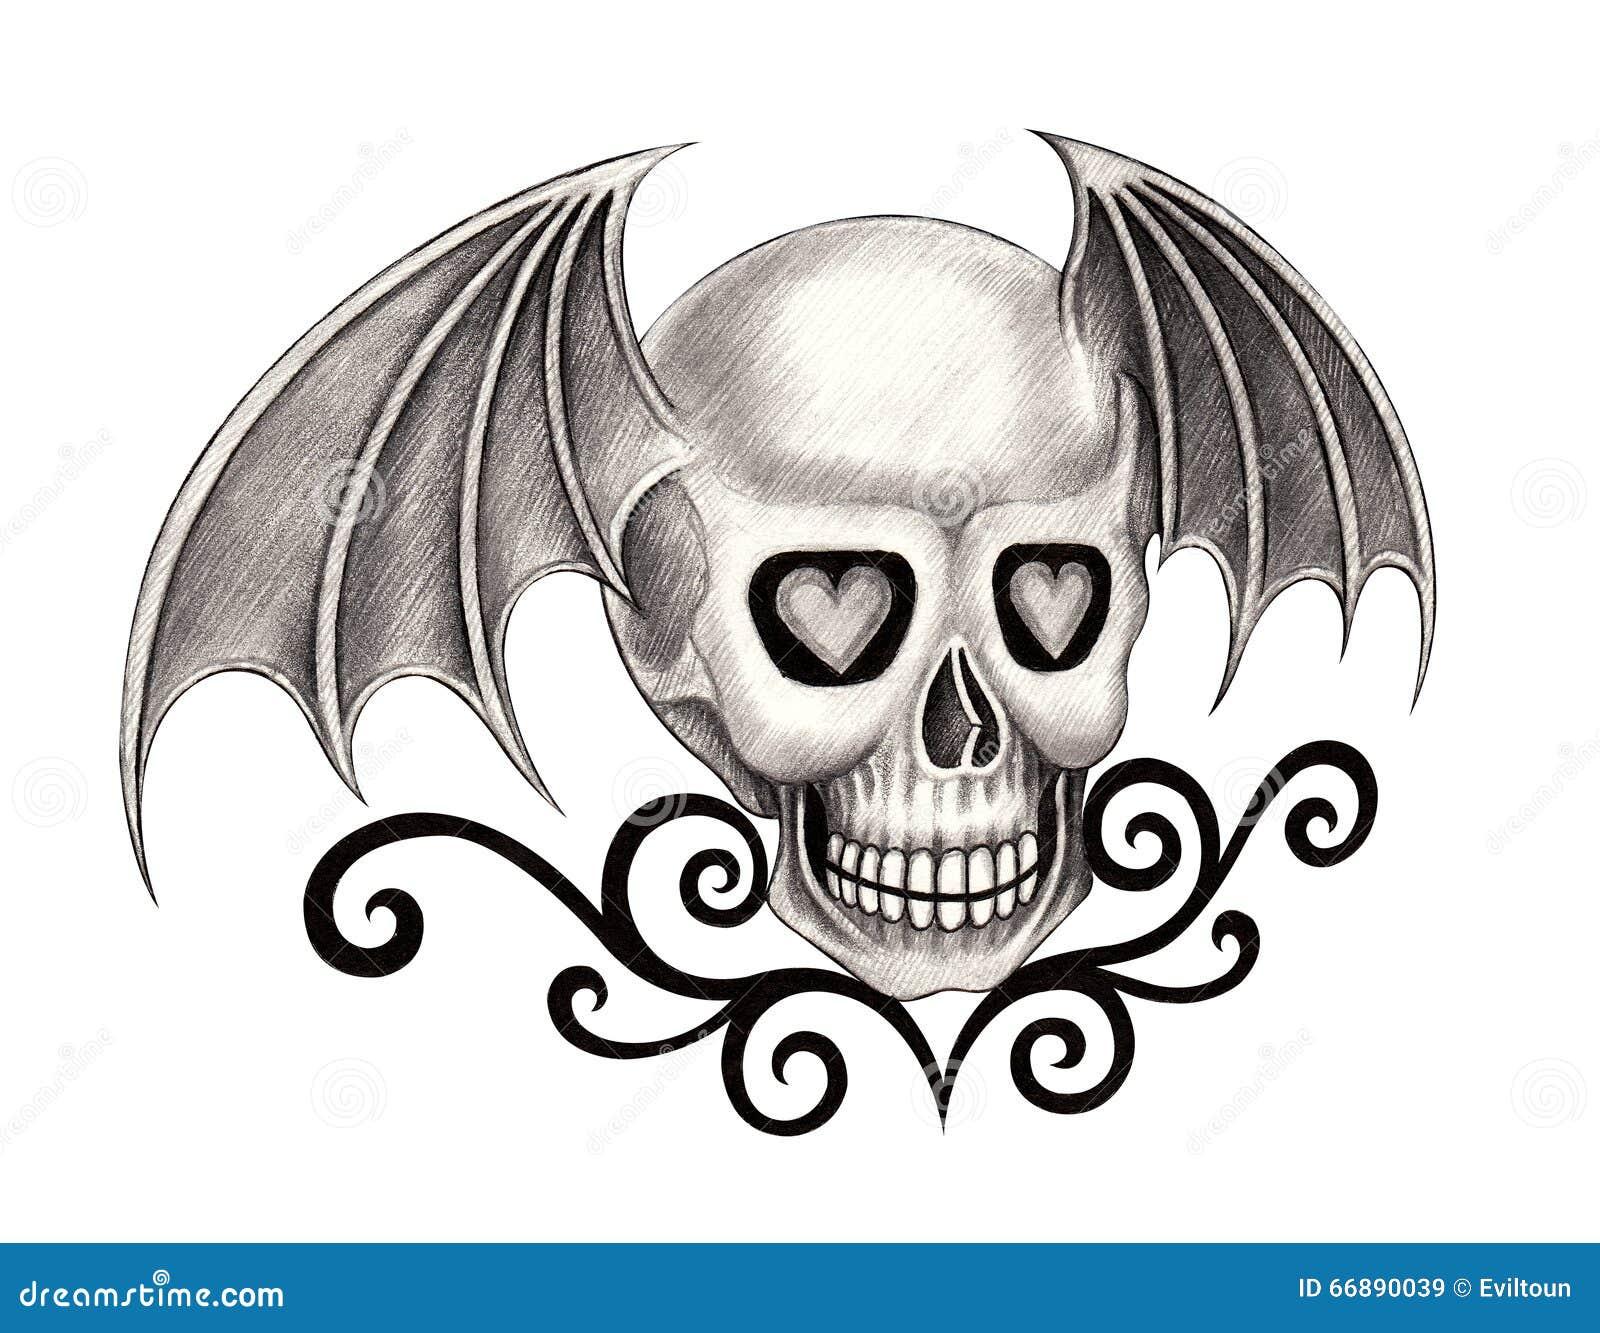 art skull wings devil tattoo stock illustration image 66890039. Black Bedroom Furniture Sets. Home Design Ideas